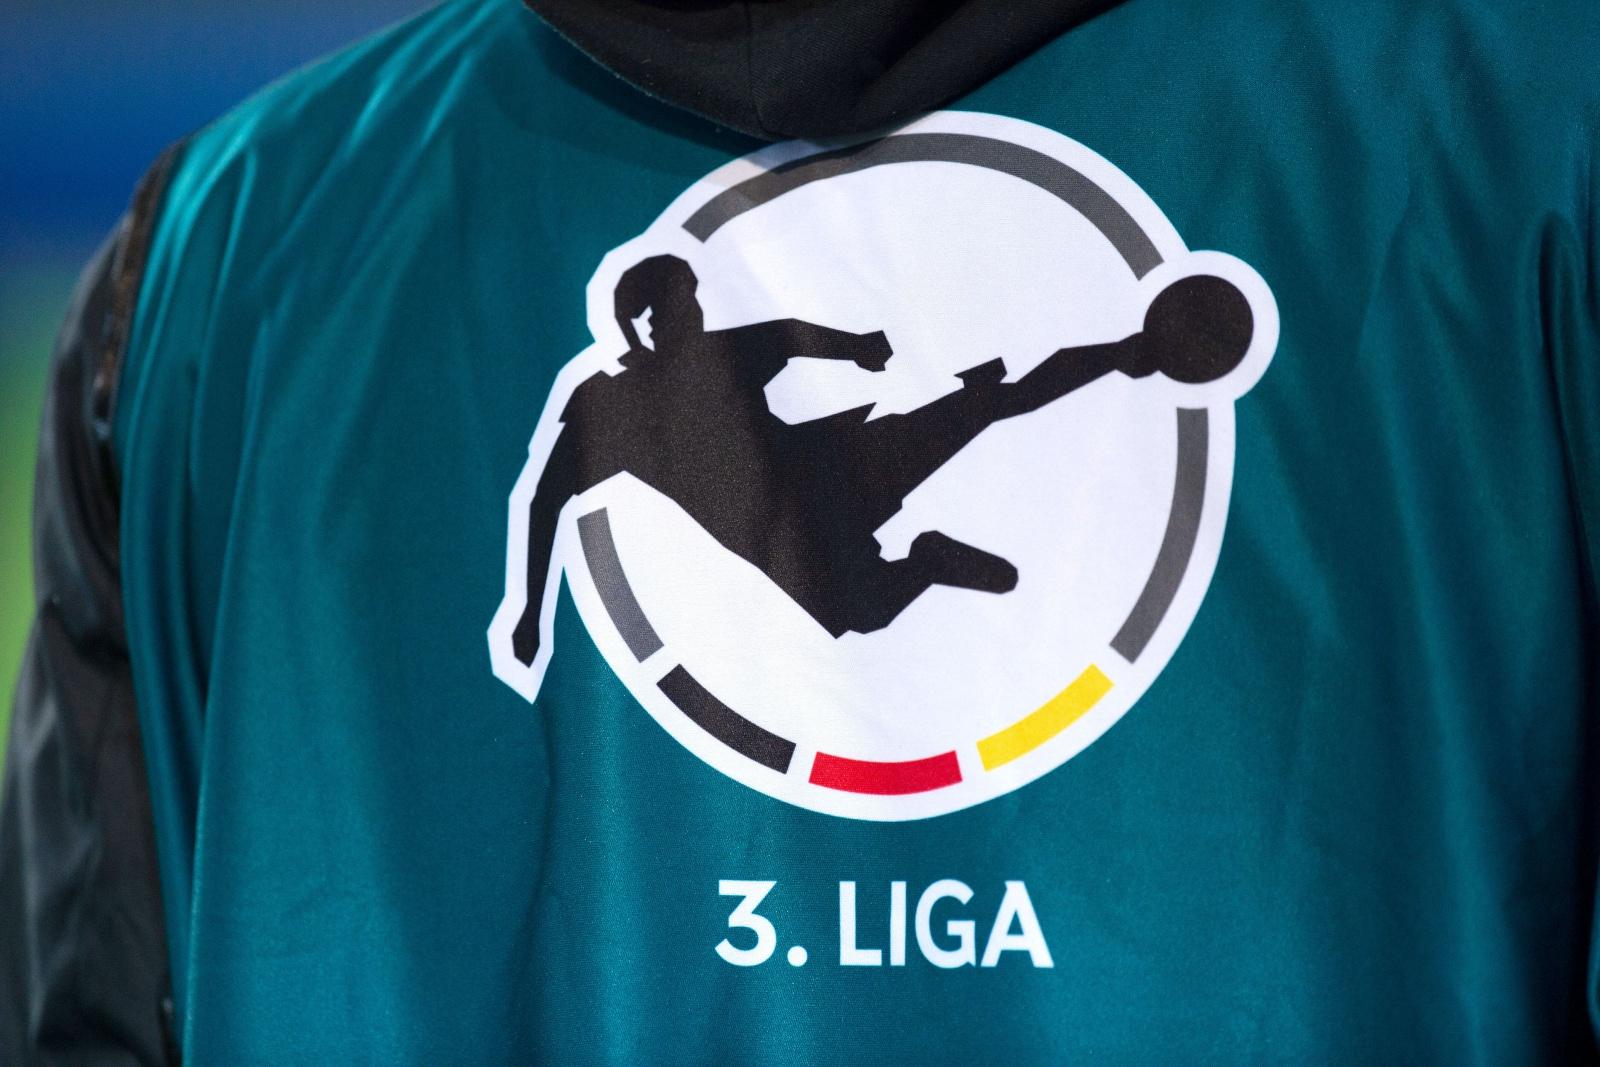 3. Liga Symbolbild